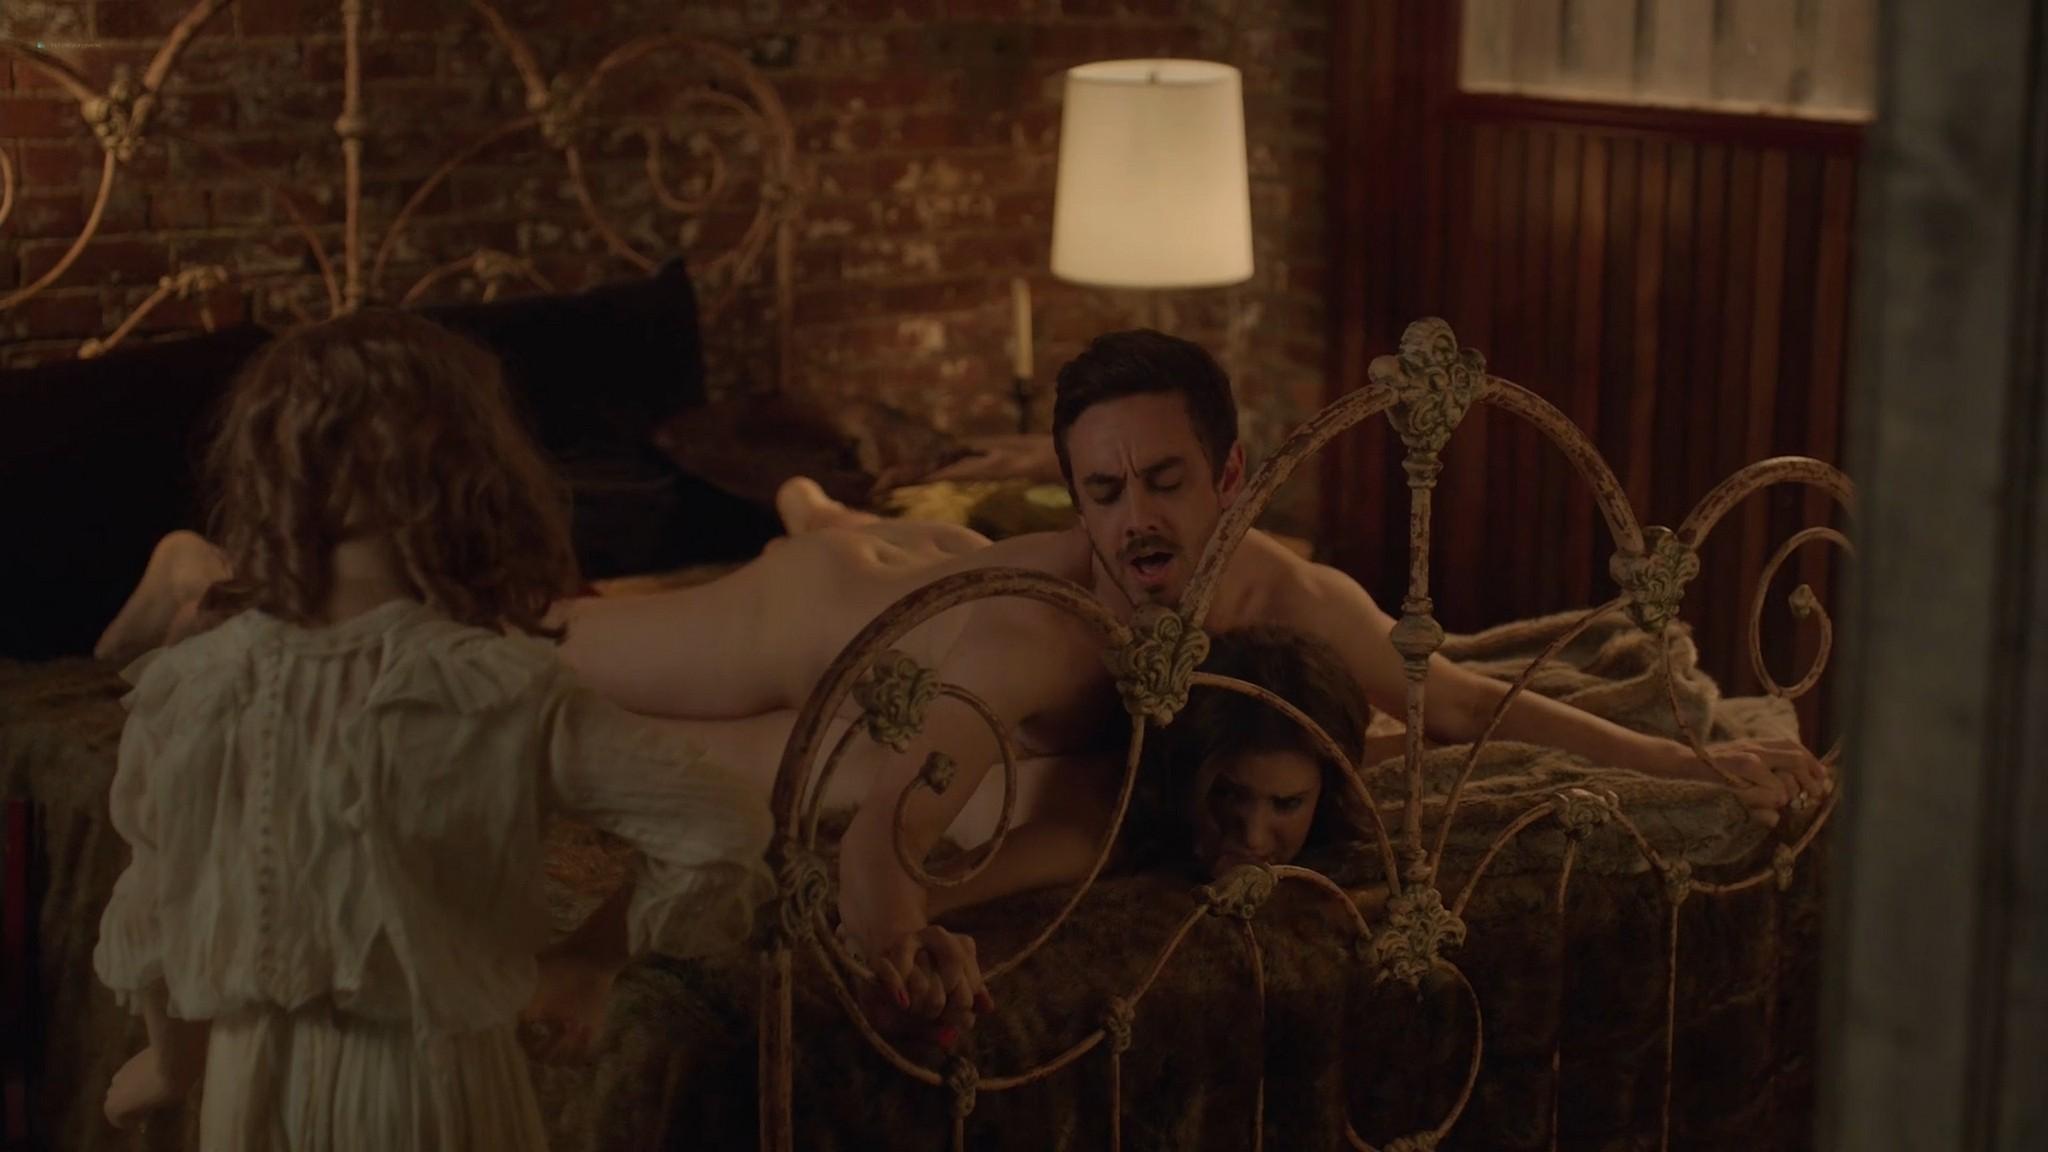 Allison Williams sex Lena Dunham nude Zosia Mamet hot Jemima Kirke nude Girls 2012 s2e1 5 1080p Web 7